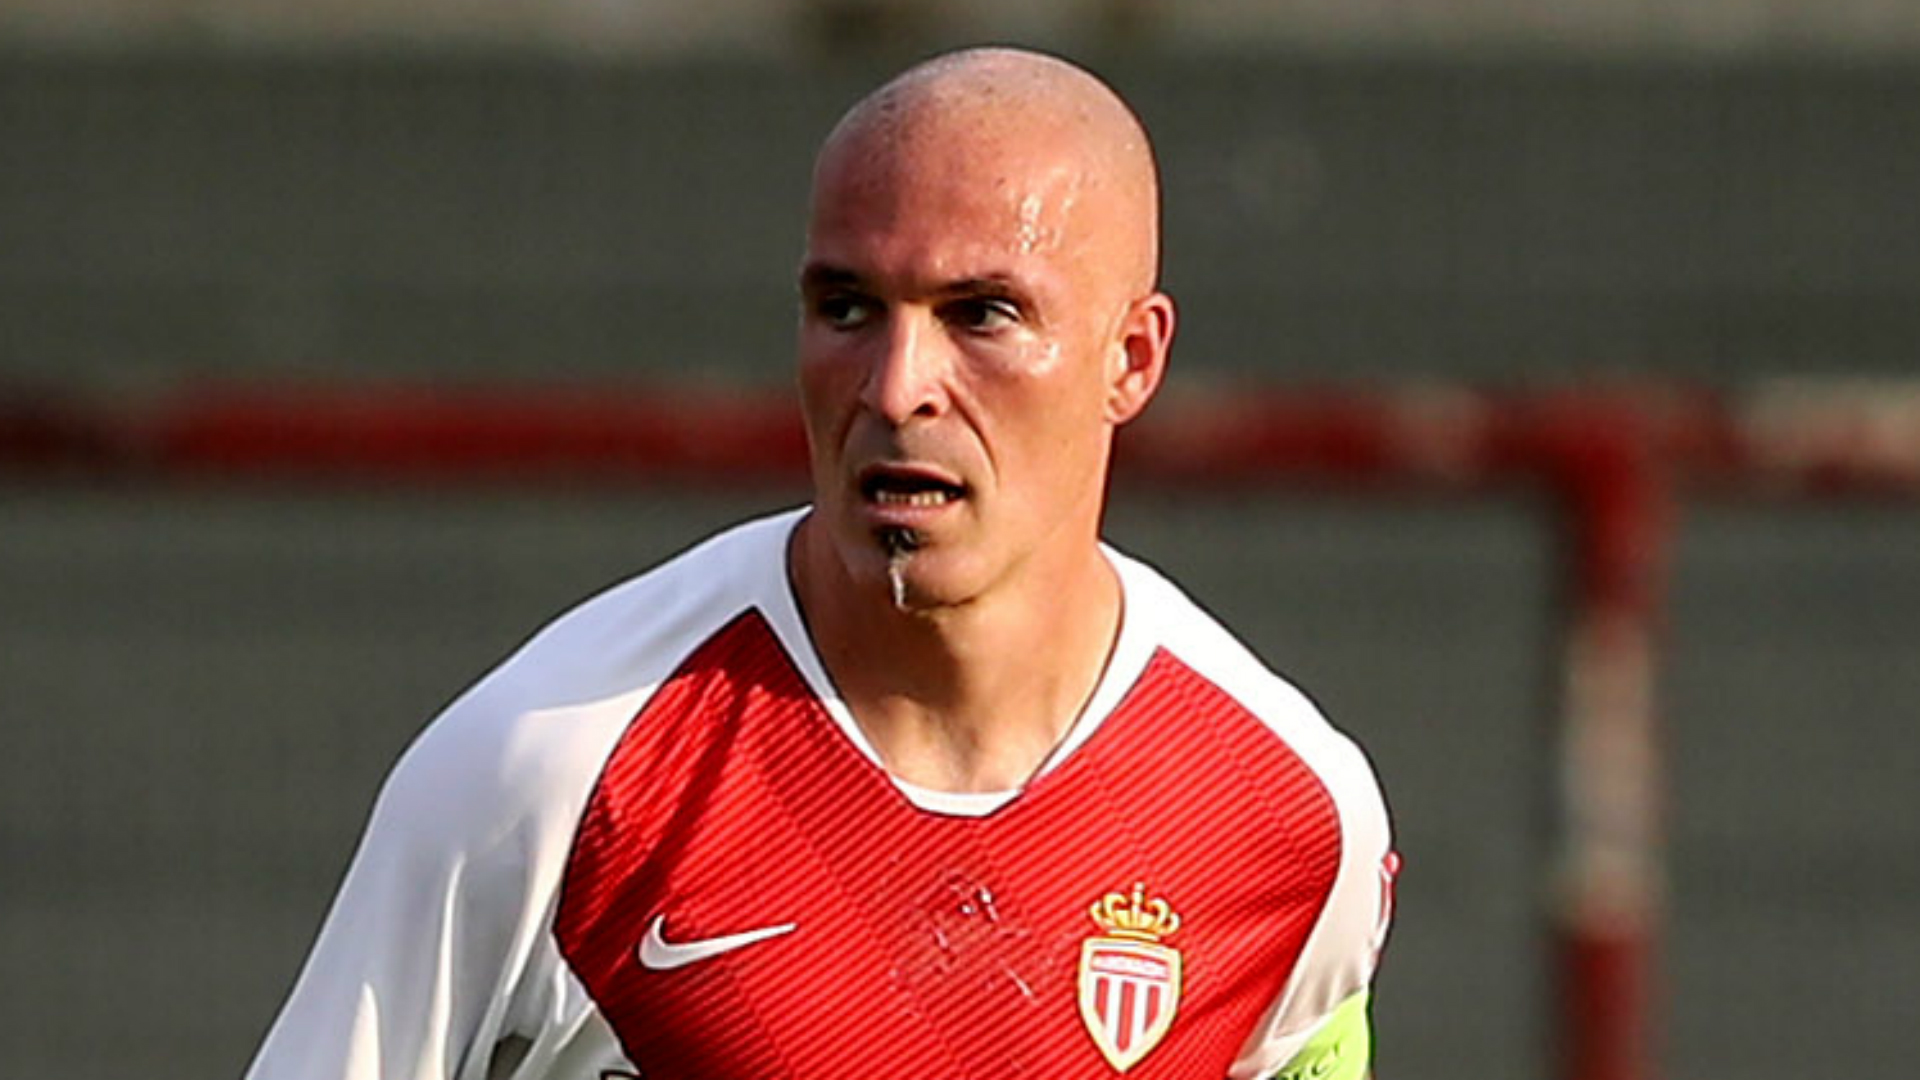 Ligue 1 winner Raggi to leave Monaco